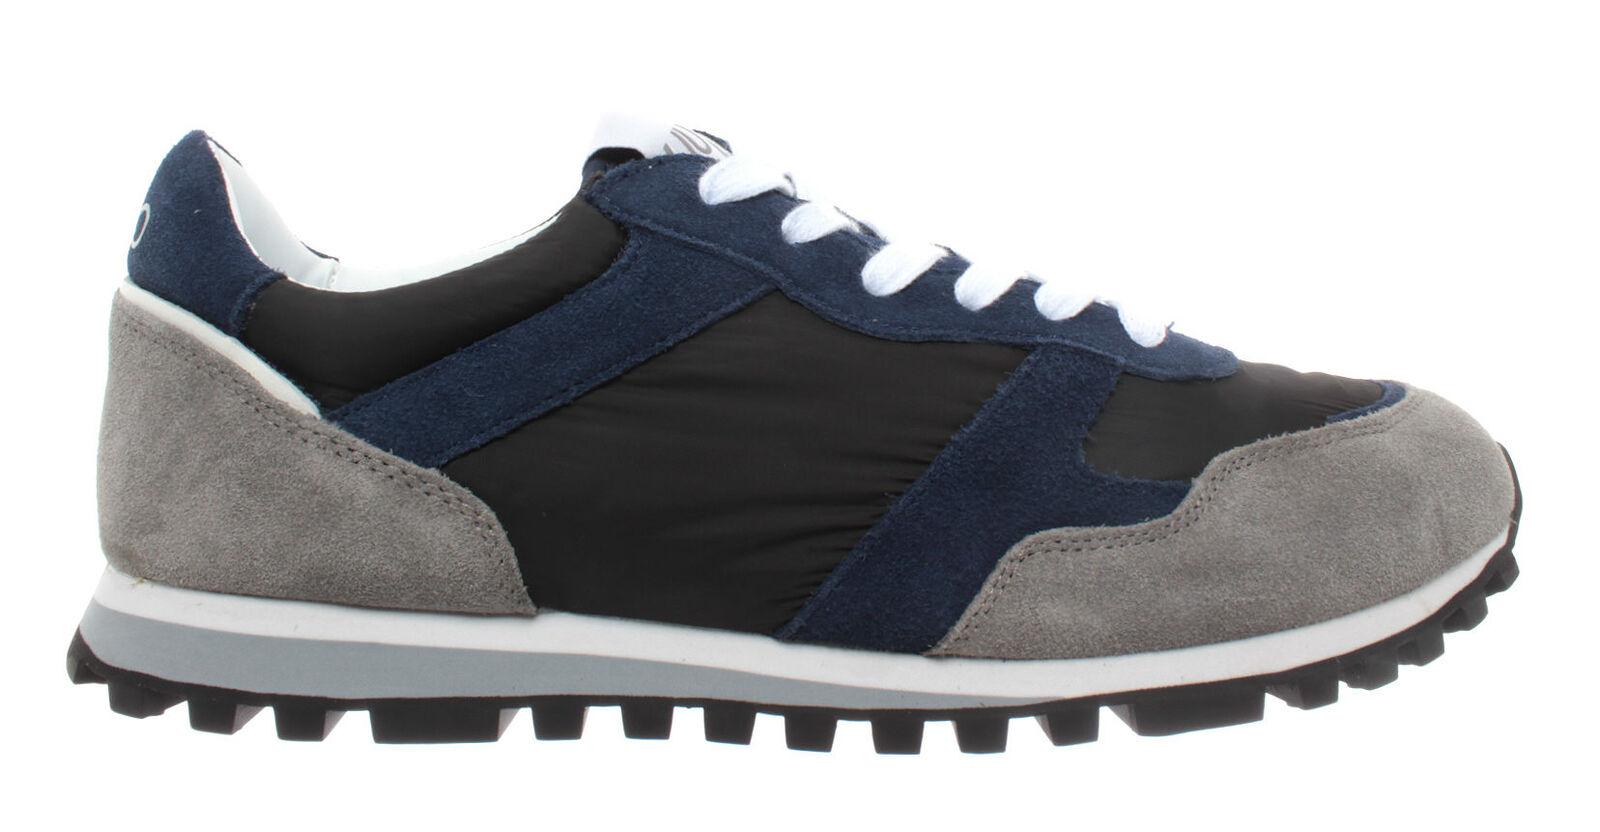 shoes men Sneakers LIU JO Milano Alex Running Plume Marine black blue